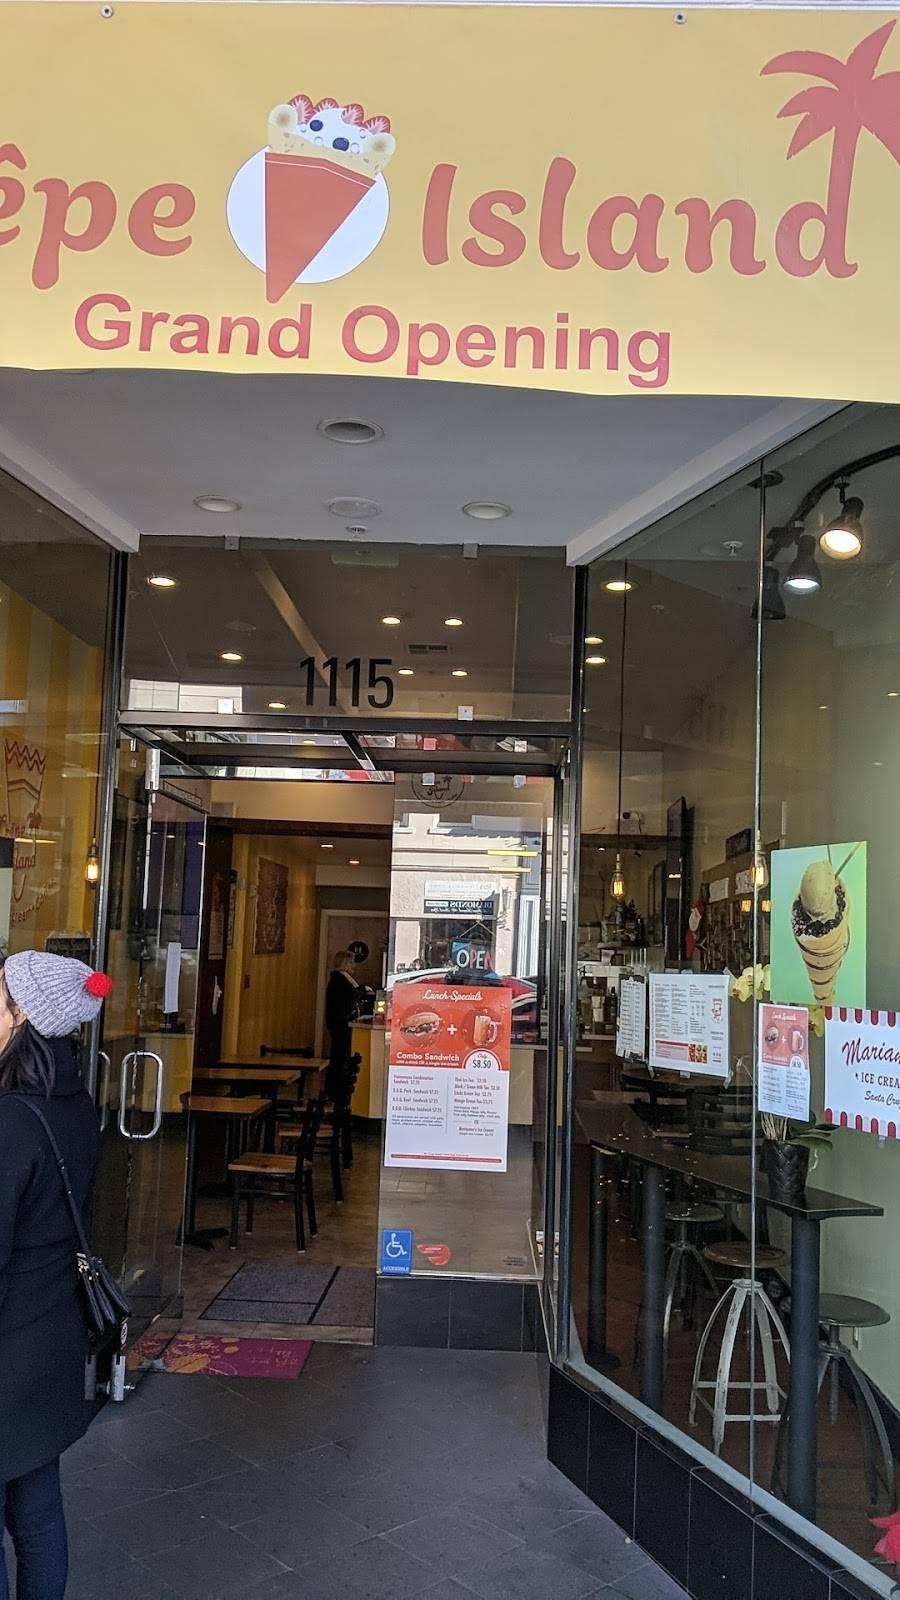 Crepe Island | restaurant | 1115 Burlingame Ave, Burlingame, CA 94010, USA